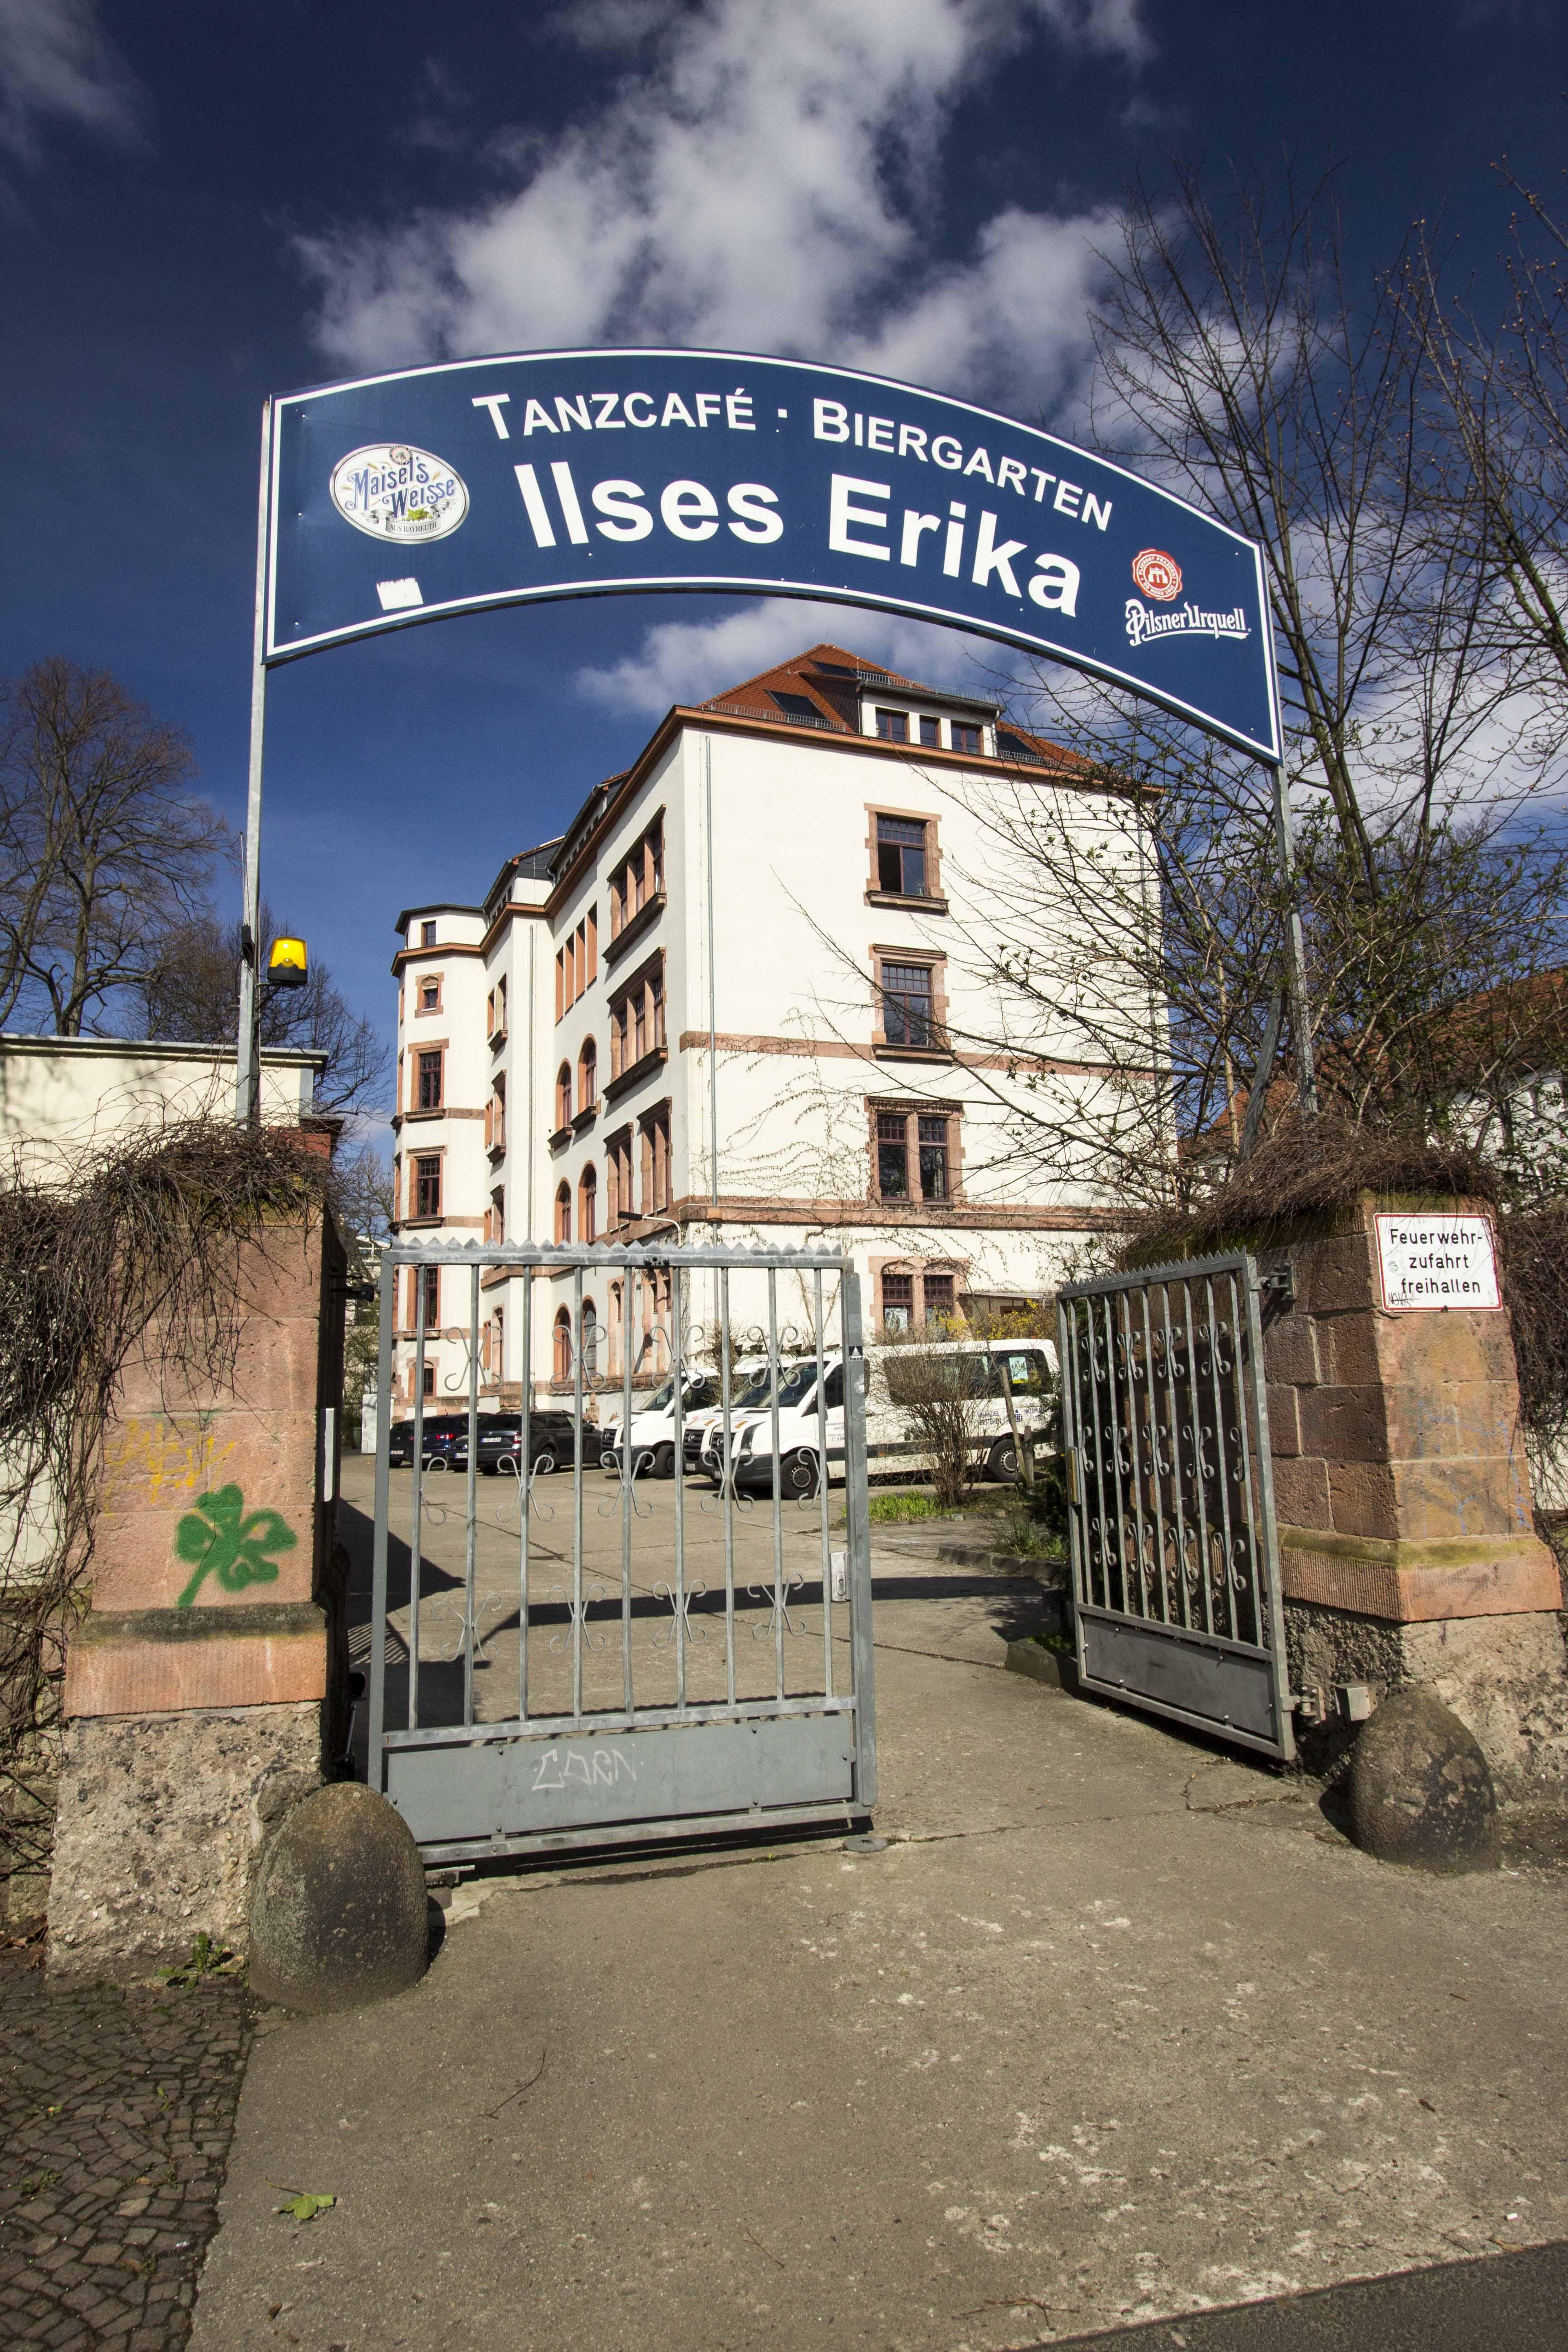 Ilses Erika